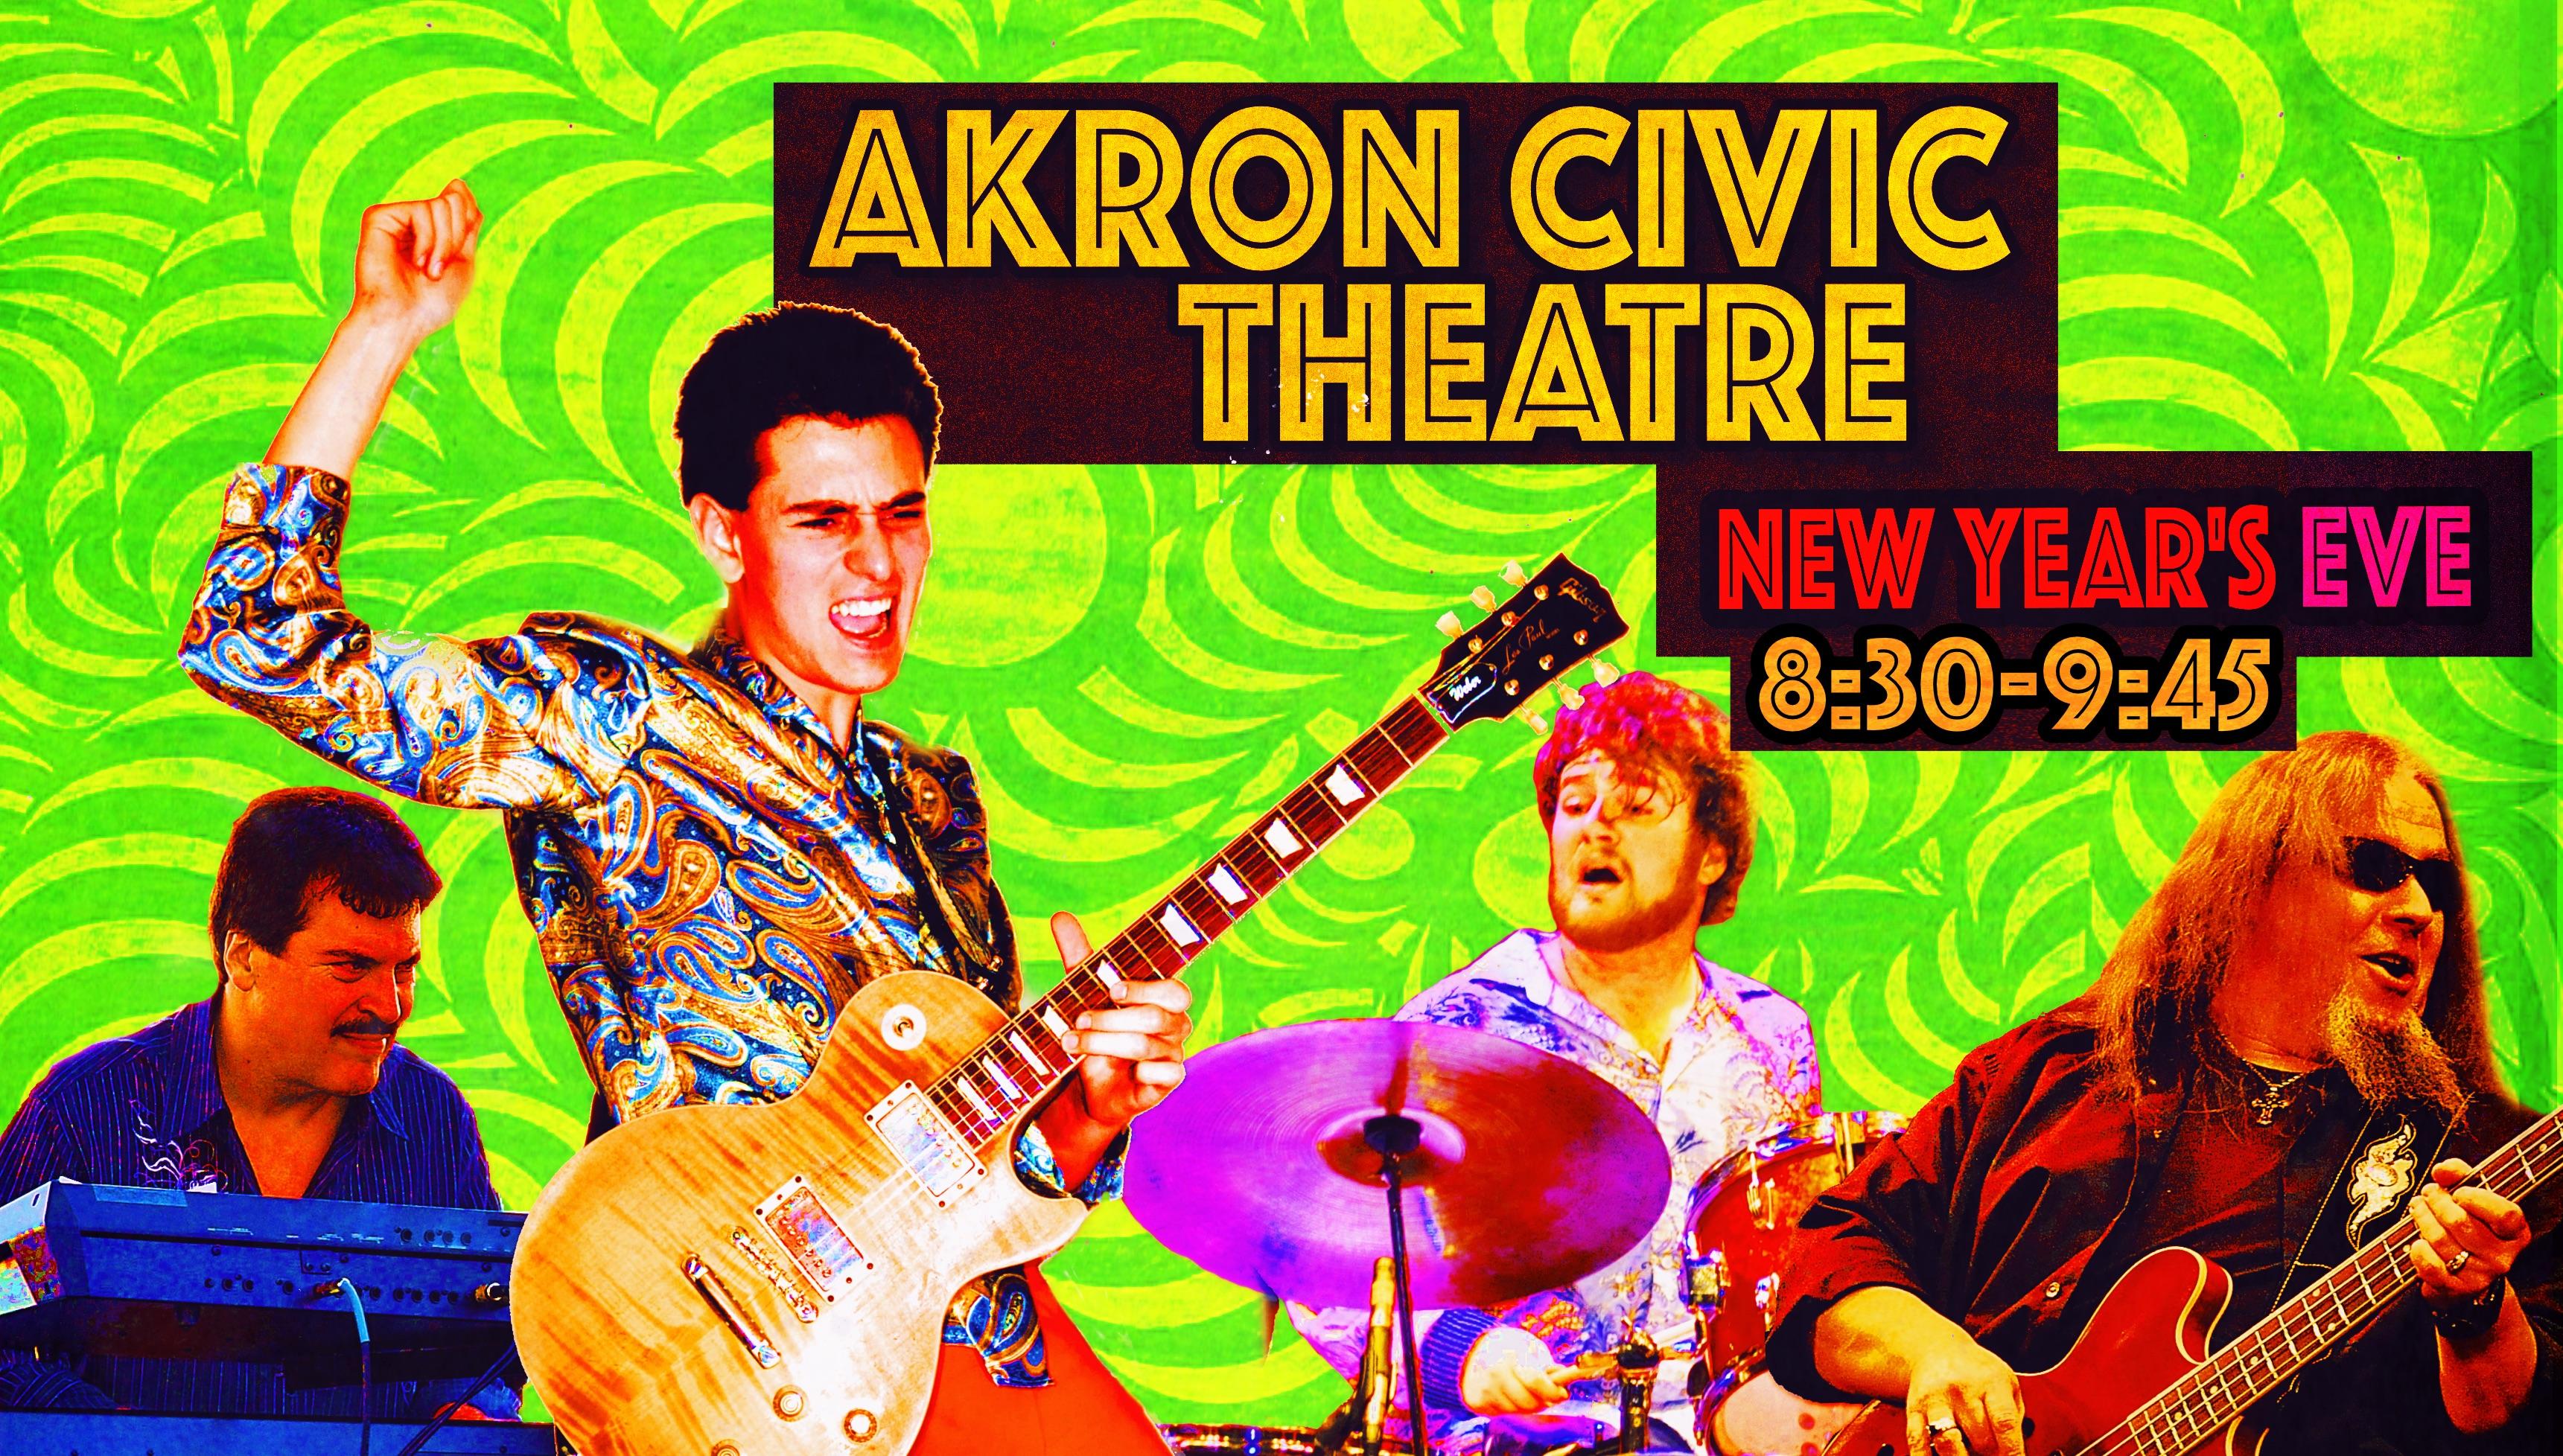 @ Akron Civic Theatre